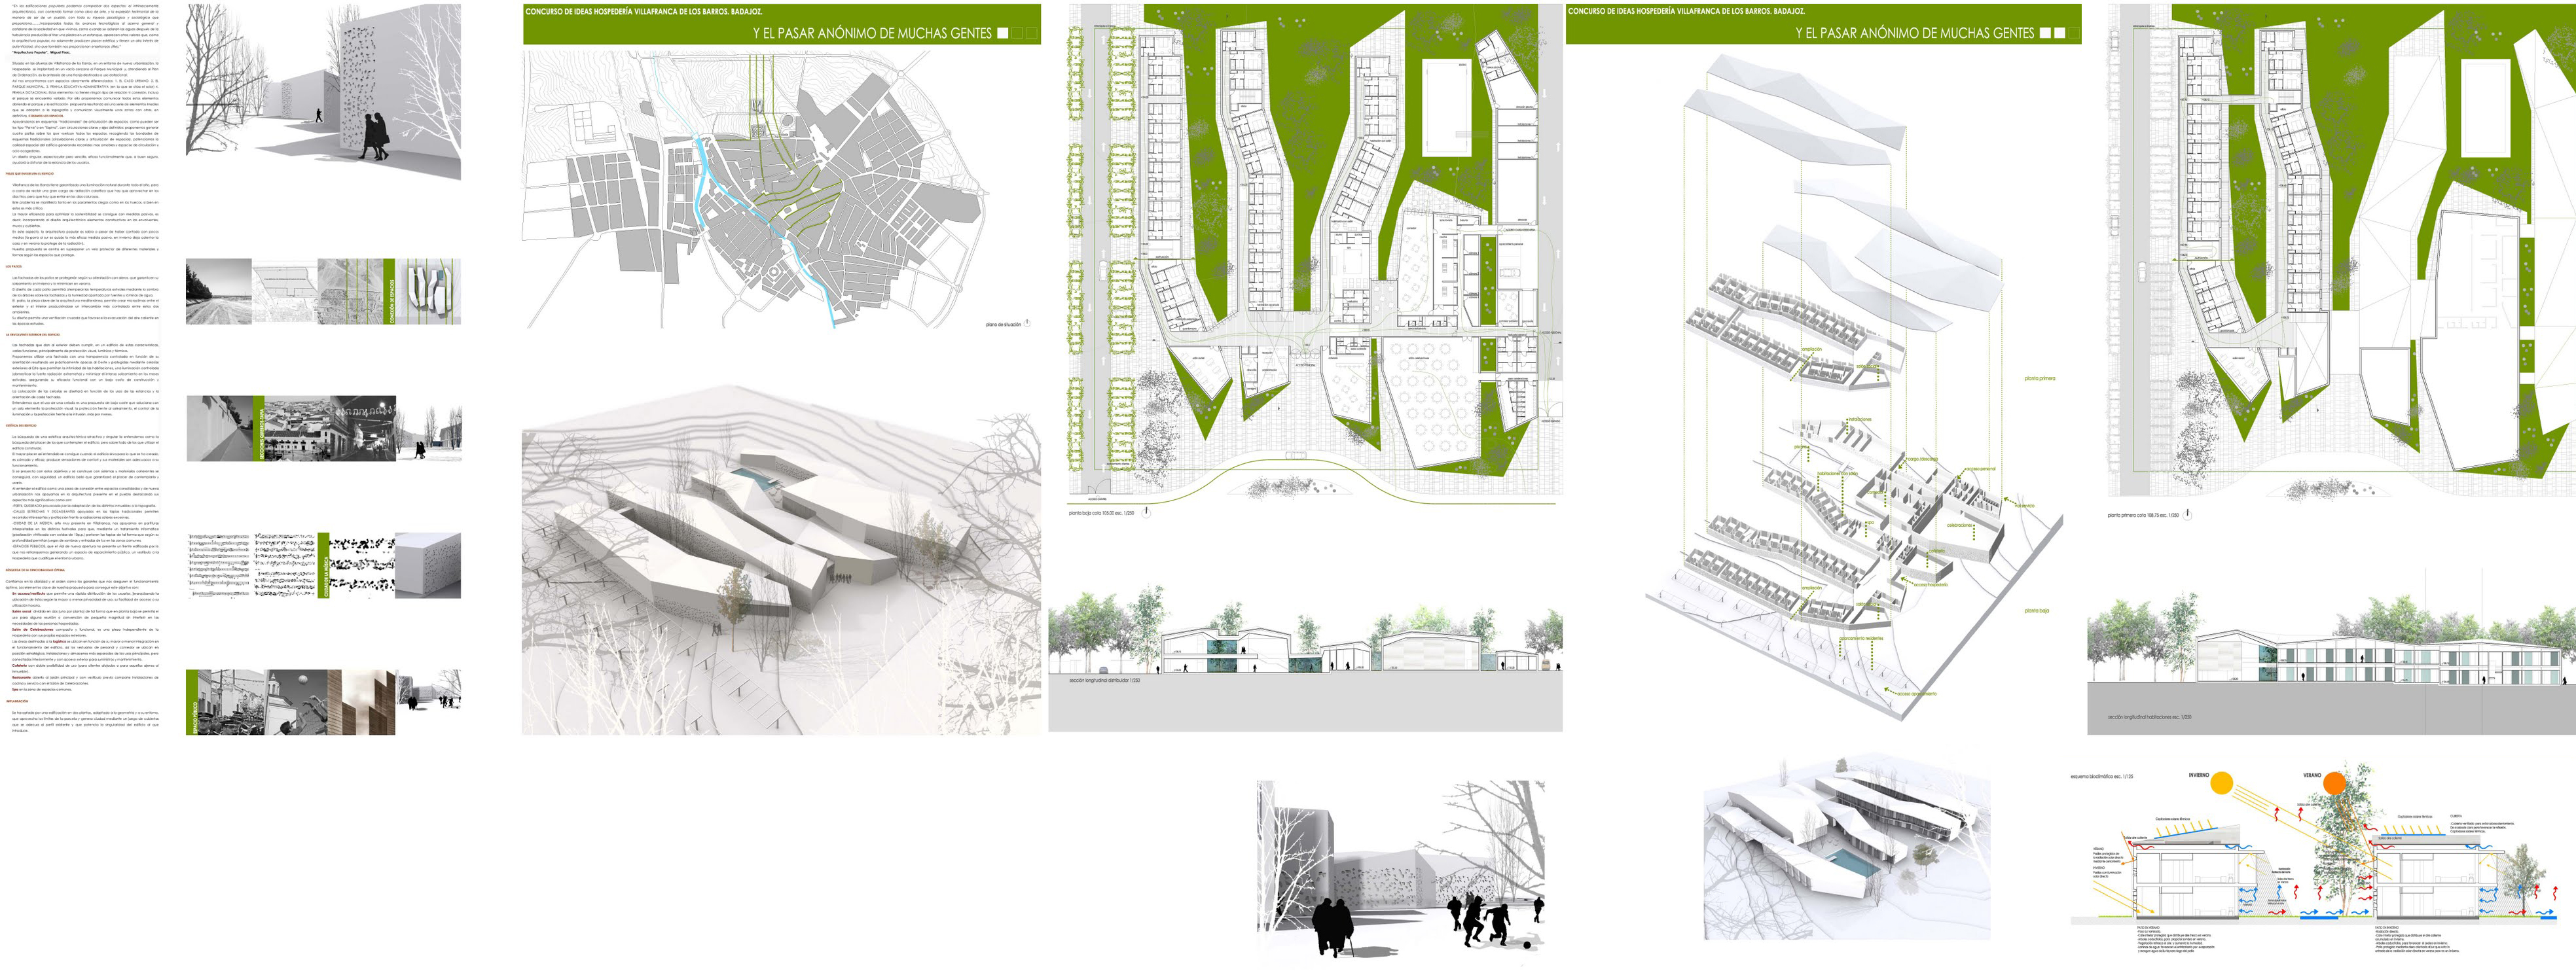 Hospeder as de turismo worksdifferent arquitectura for Arquitectura de proyectos